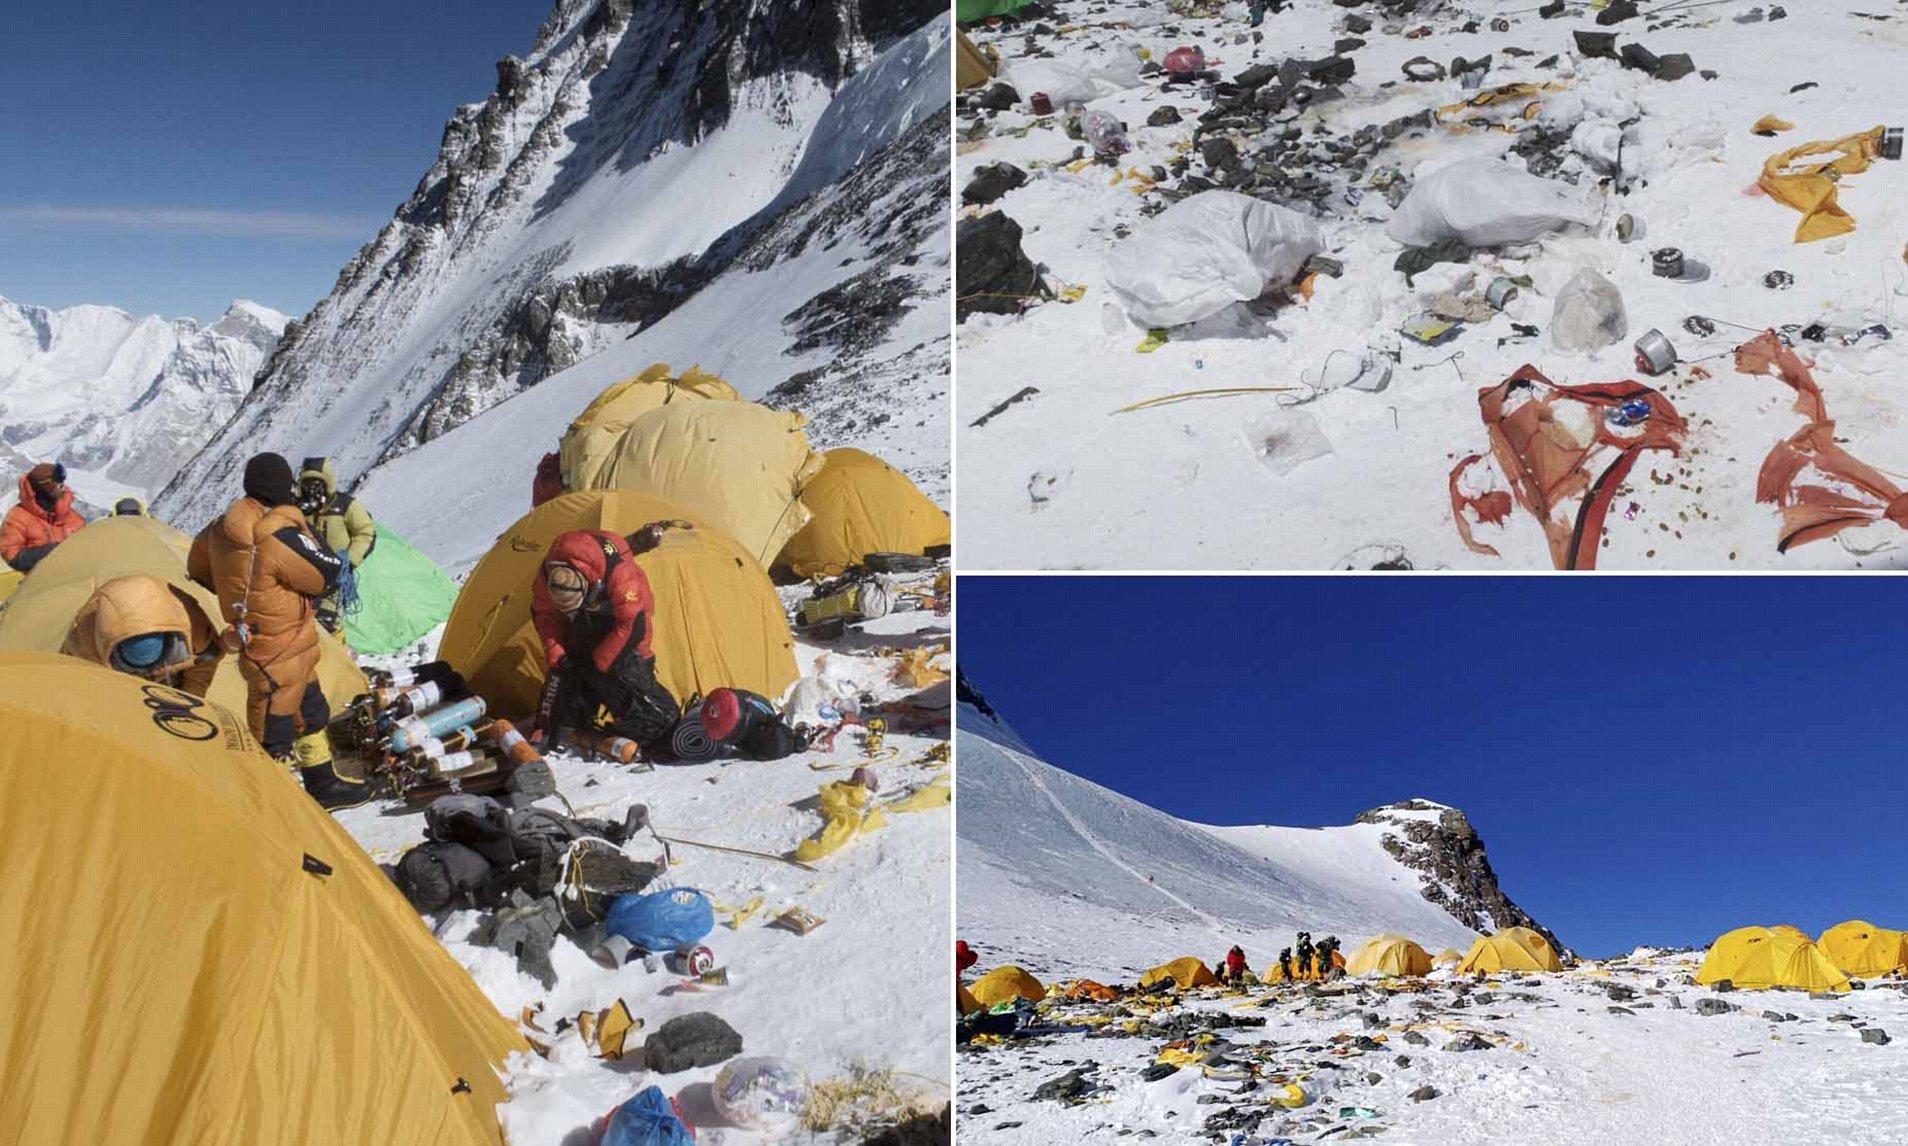 Горы мусора на горе Джомолунгма